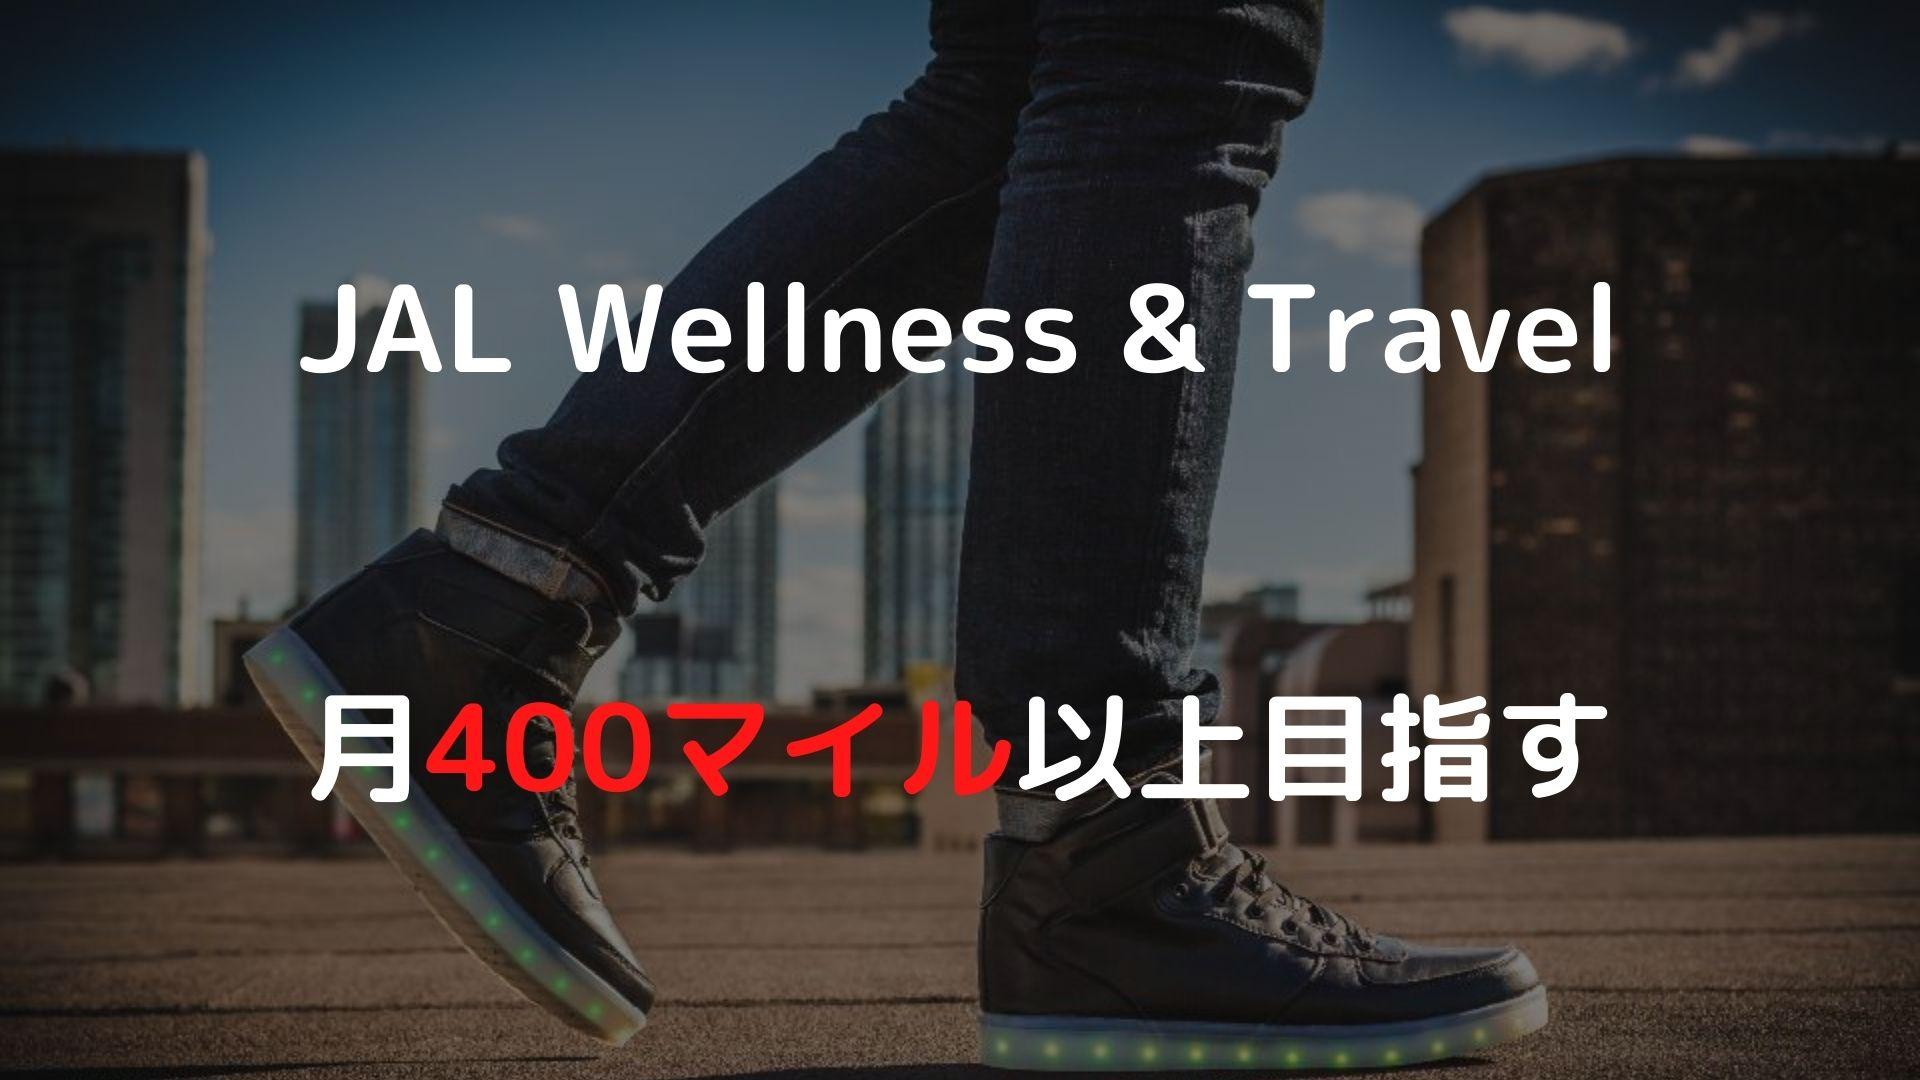 JAL Wellness & Travel 月400マイル以上目指す